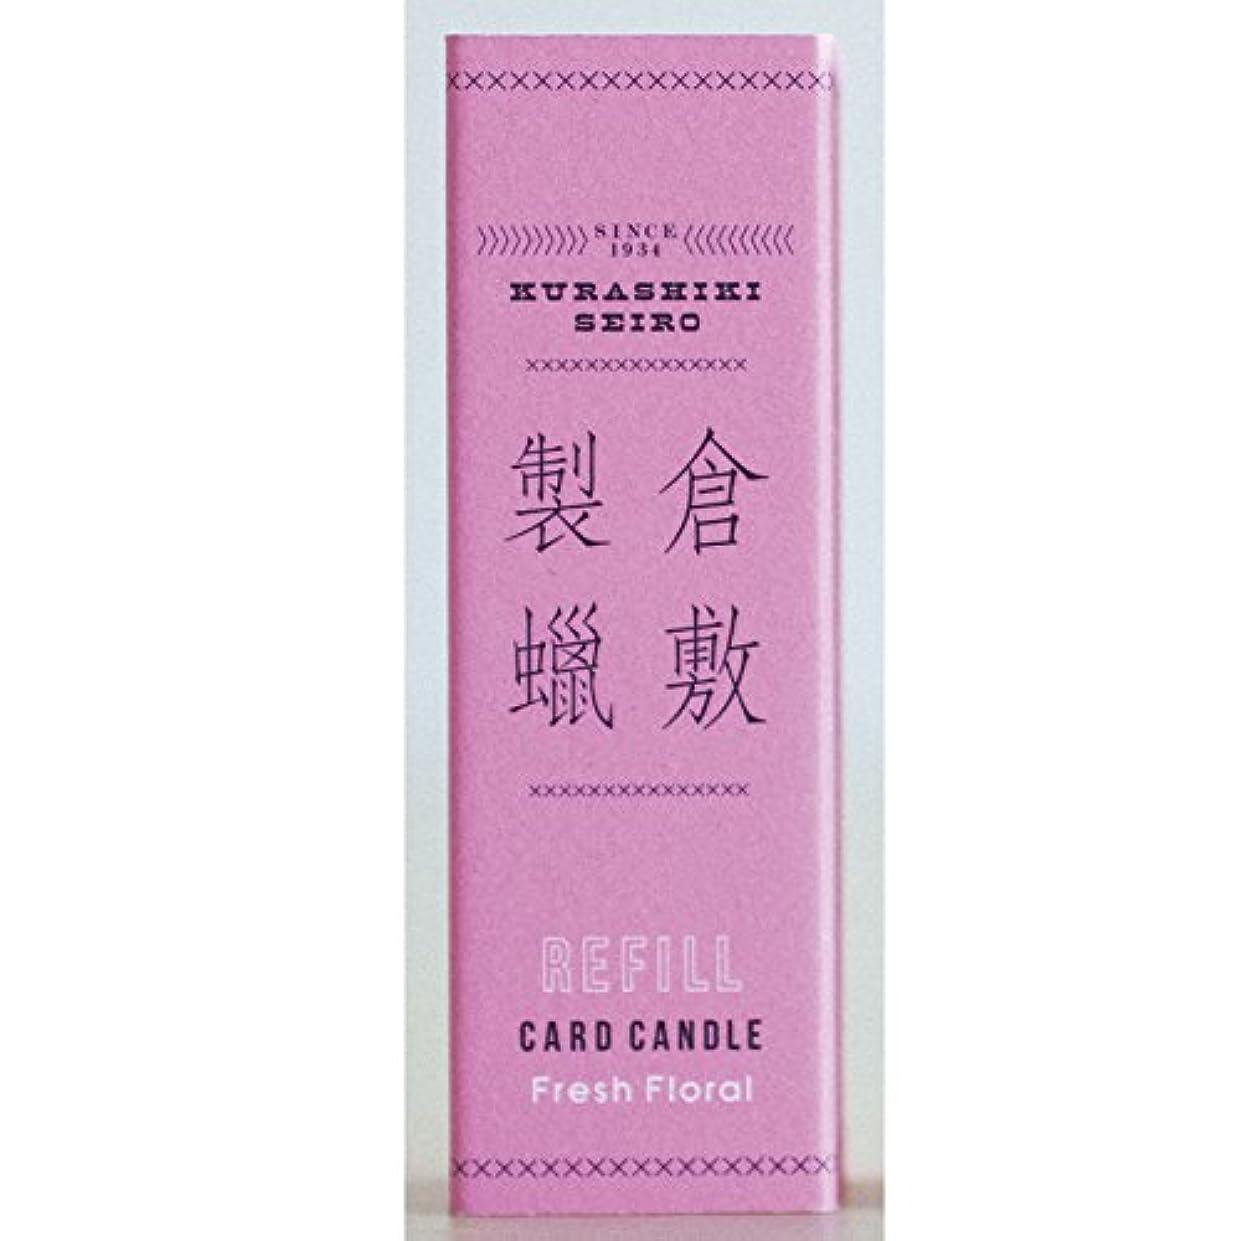 記念陪審蛾倉敷製蝋 CARD CANDLE REFILL (Fresh Floral)